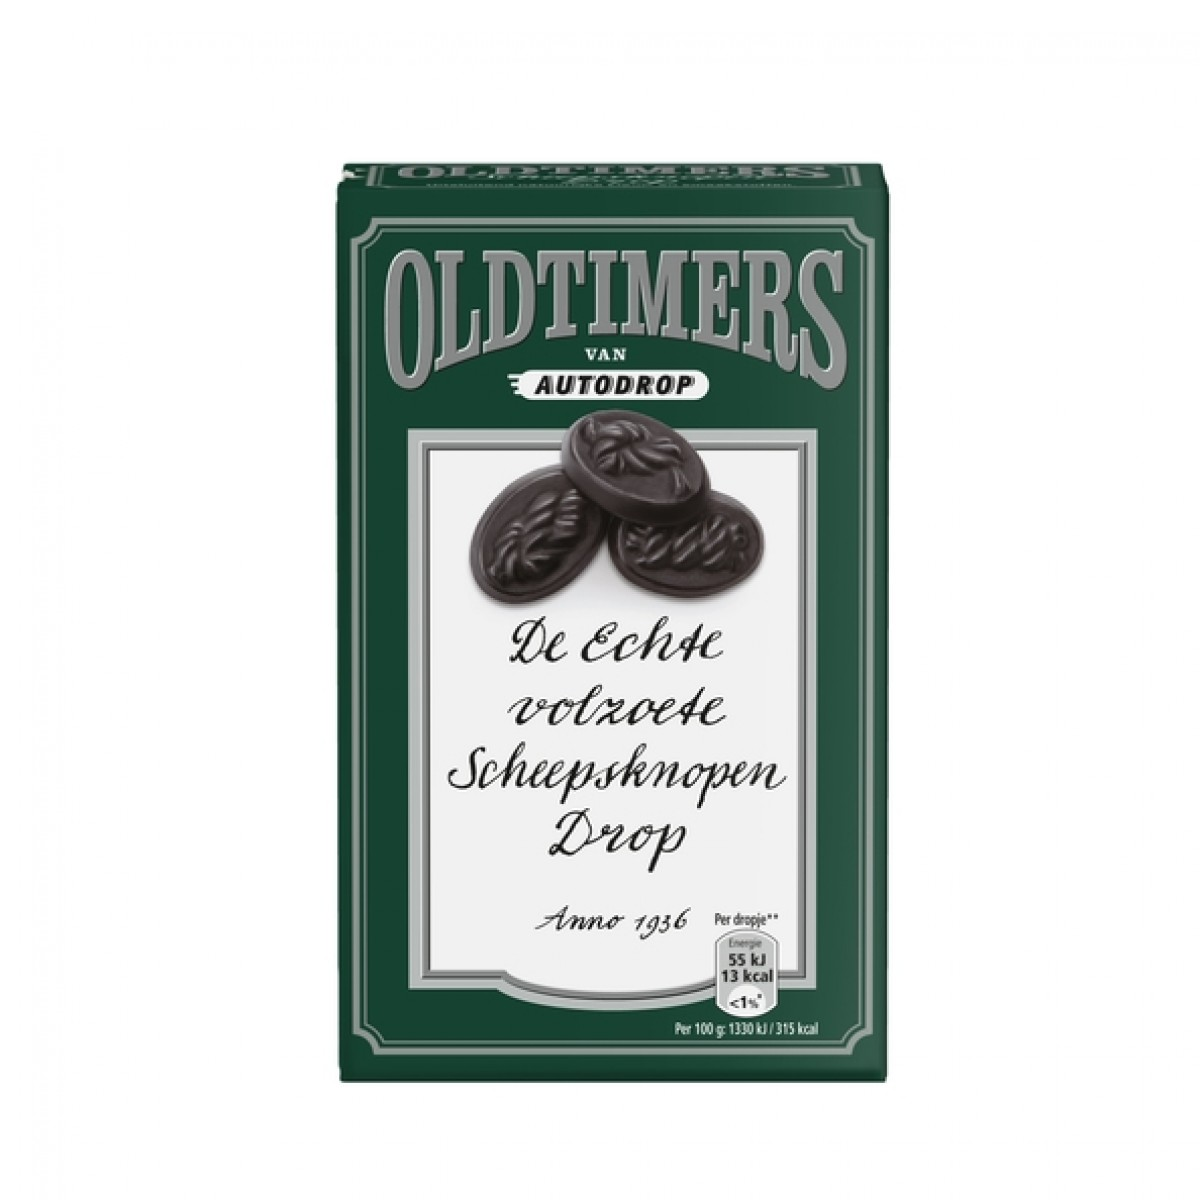 Oldtimers Scheepsknopen Drop